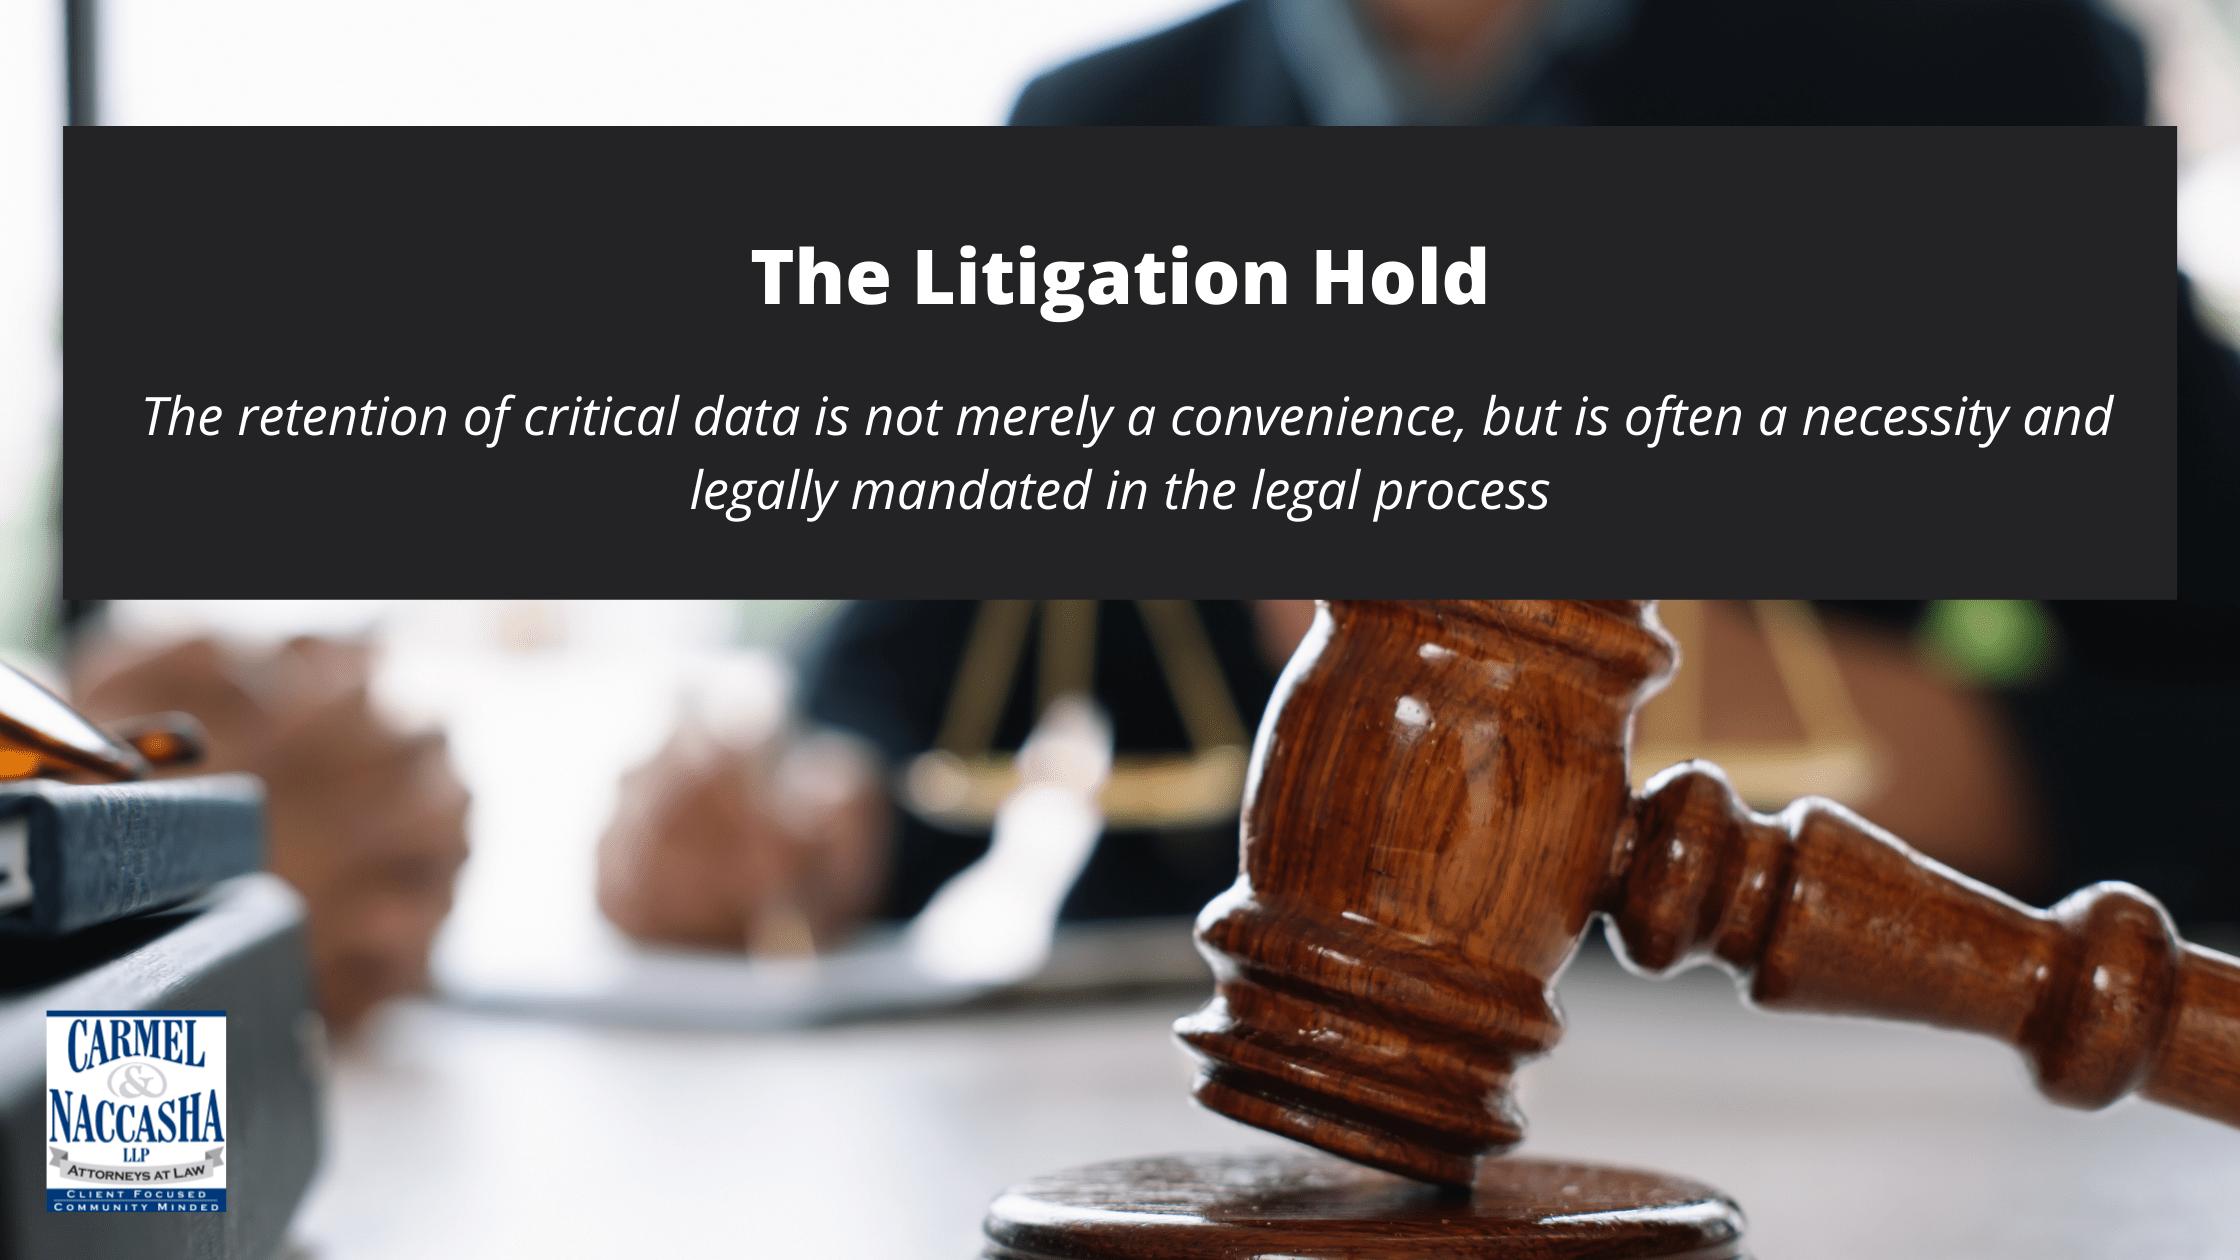 The Litigation Hold